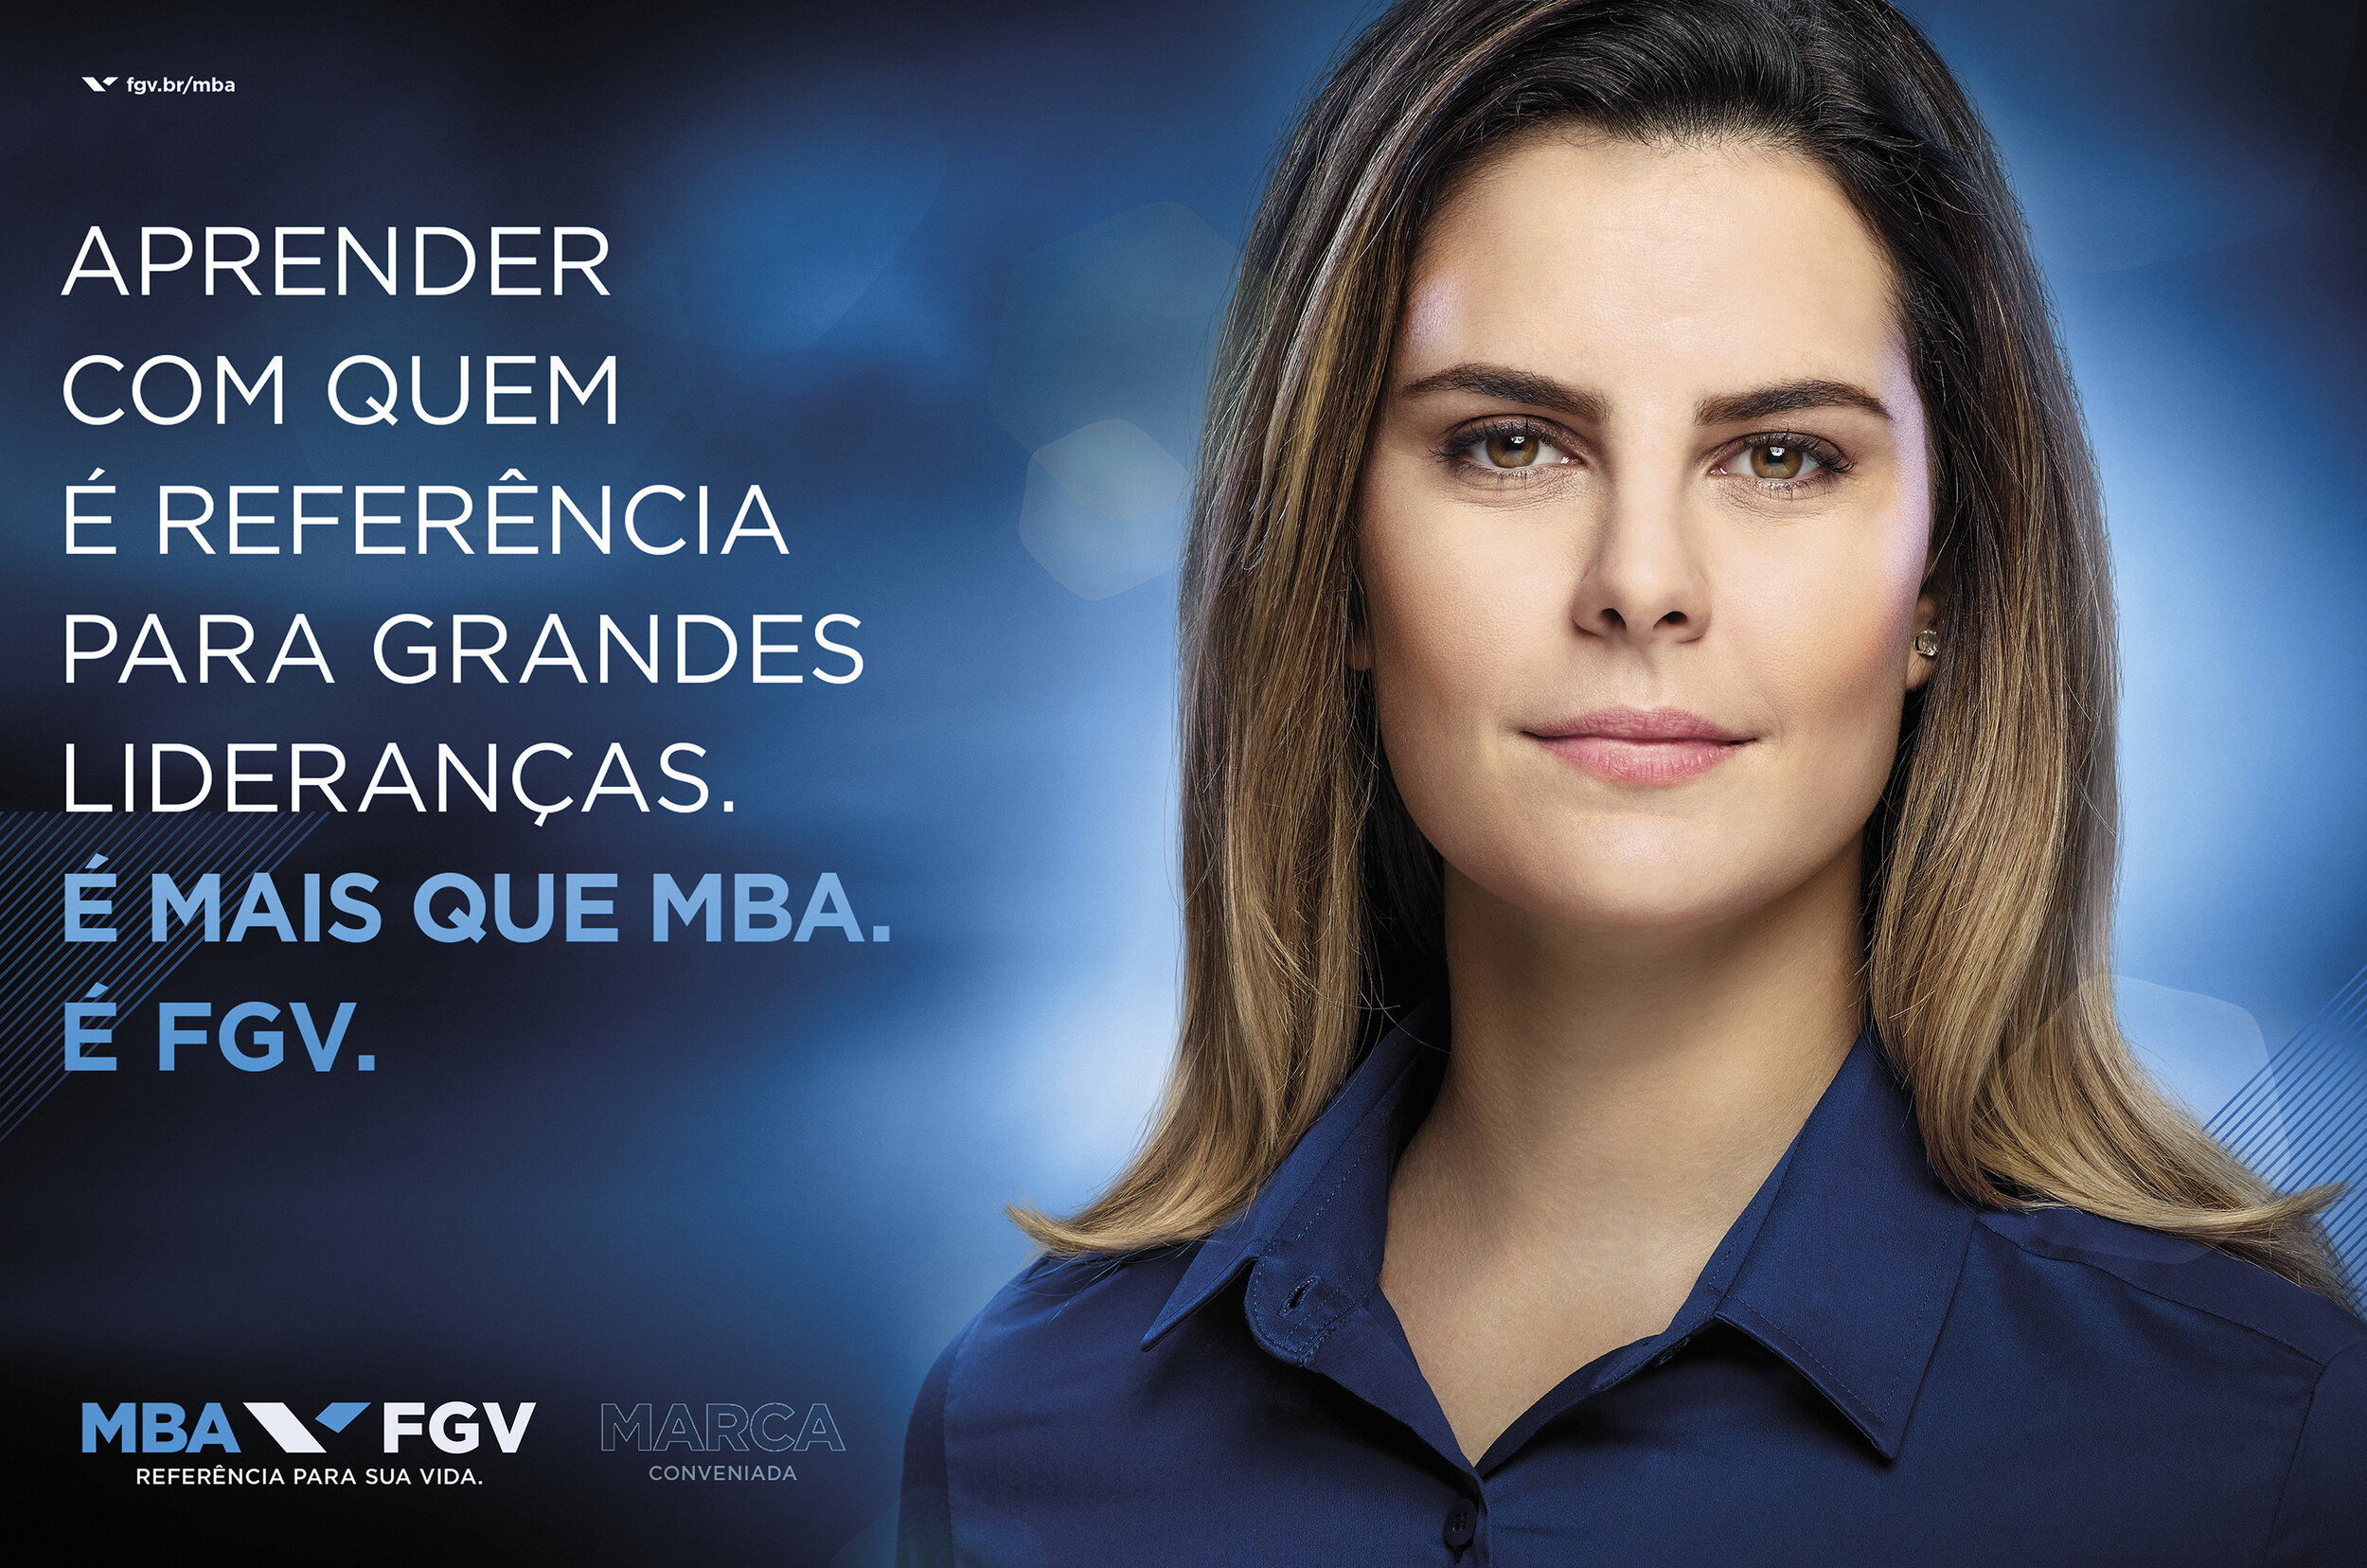 FGV MBA48159_mulher_02Site copie.jpg